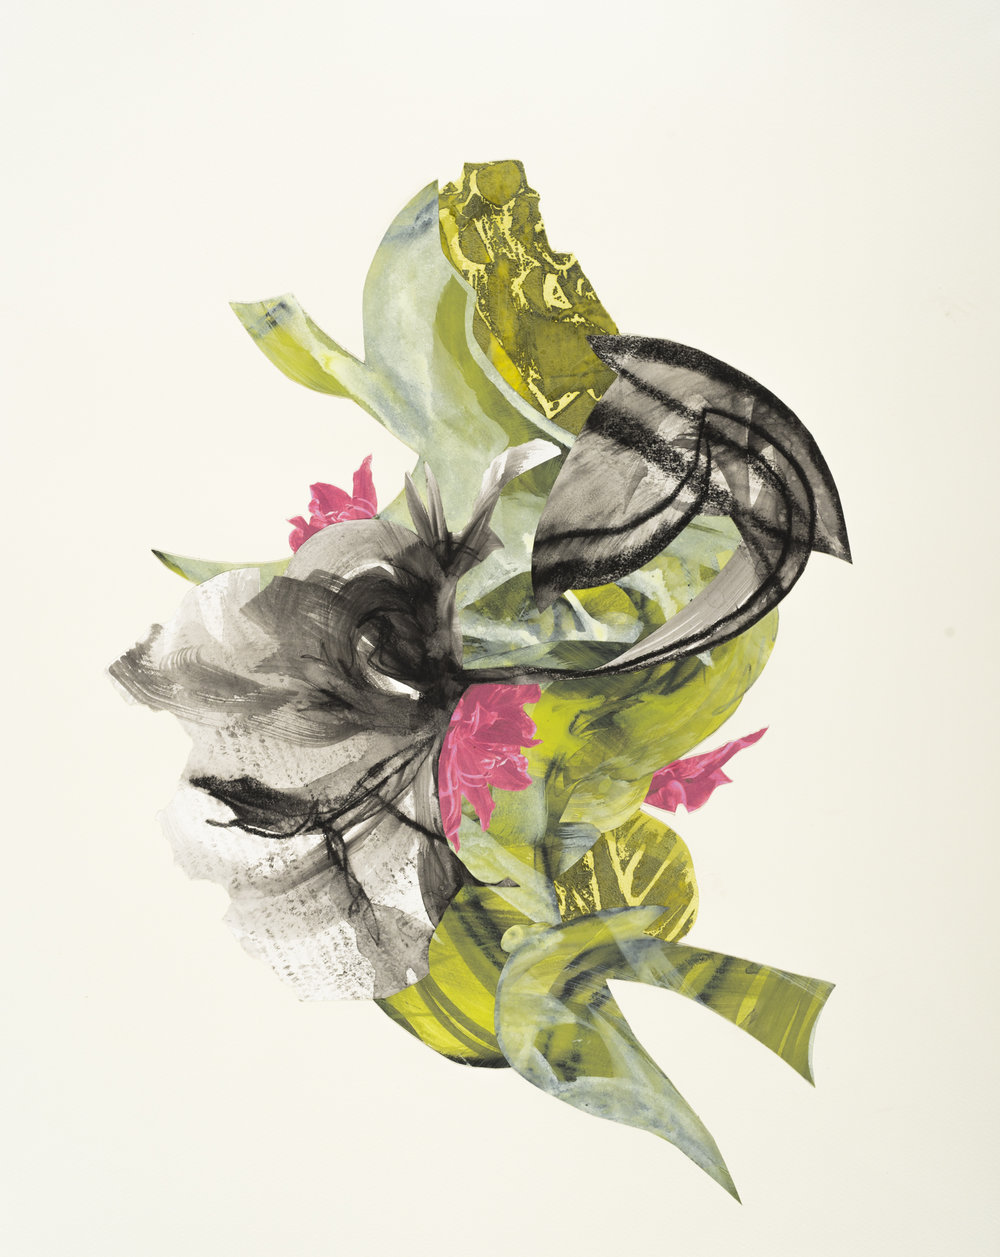 """Dancer"", mixed media collage, 22"" x 28"", $850 (framed)"